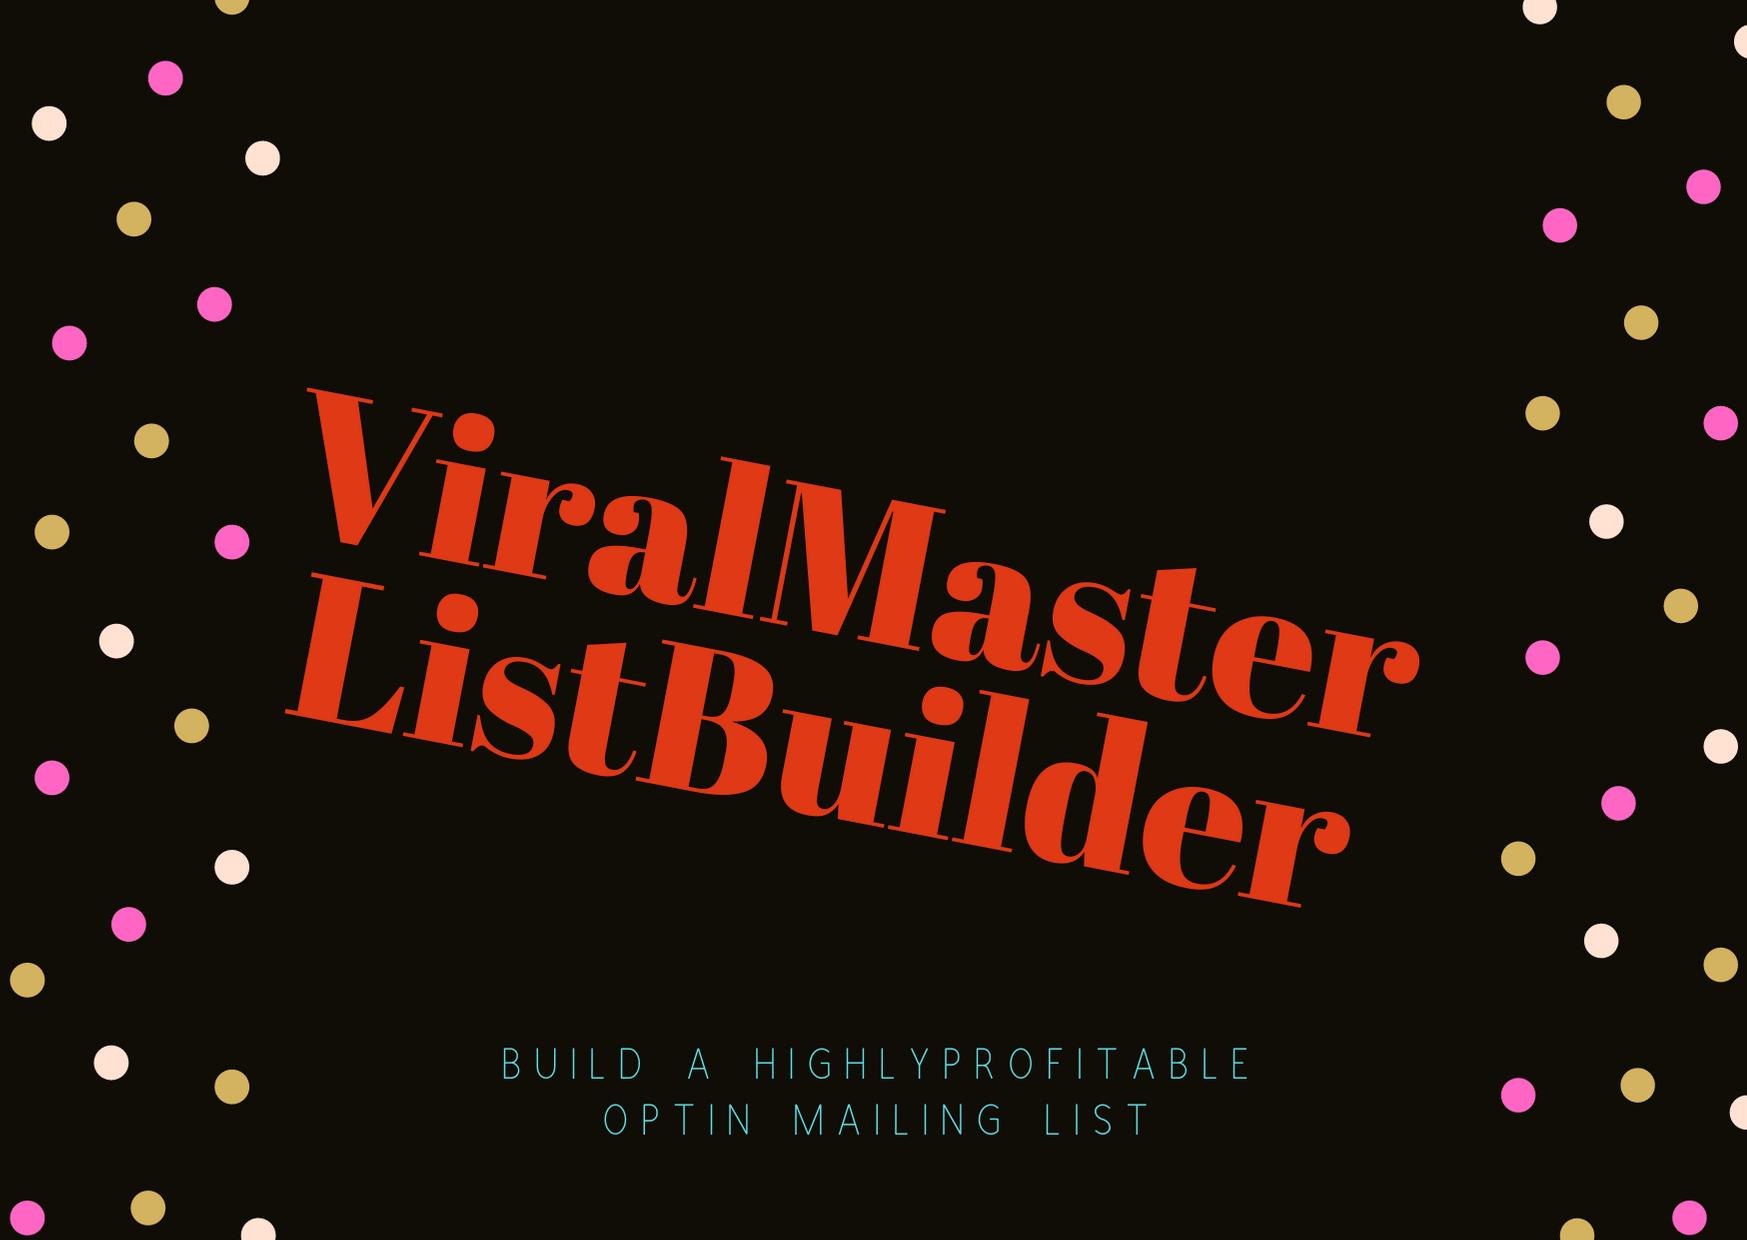 ViralMasterListBuilder, Build a highly profitable optin mailing list